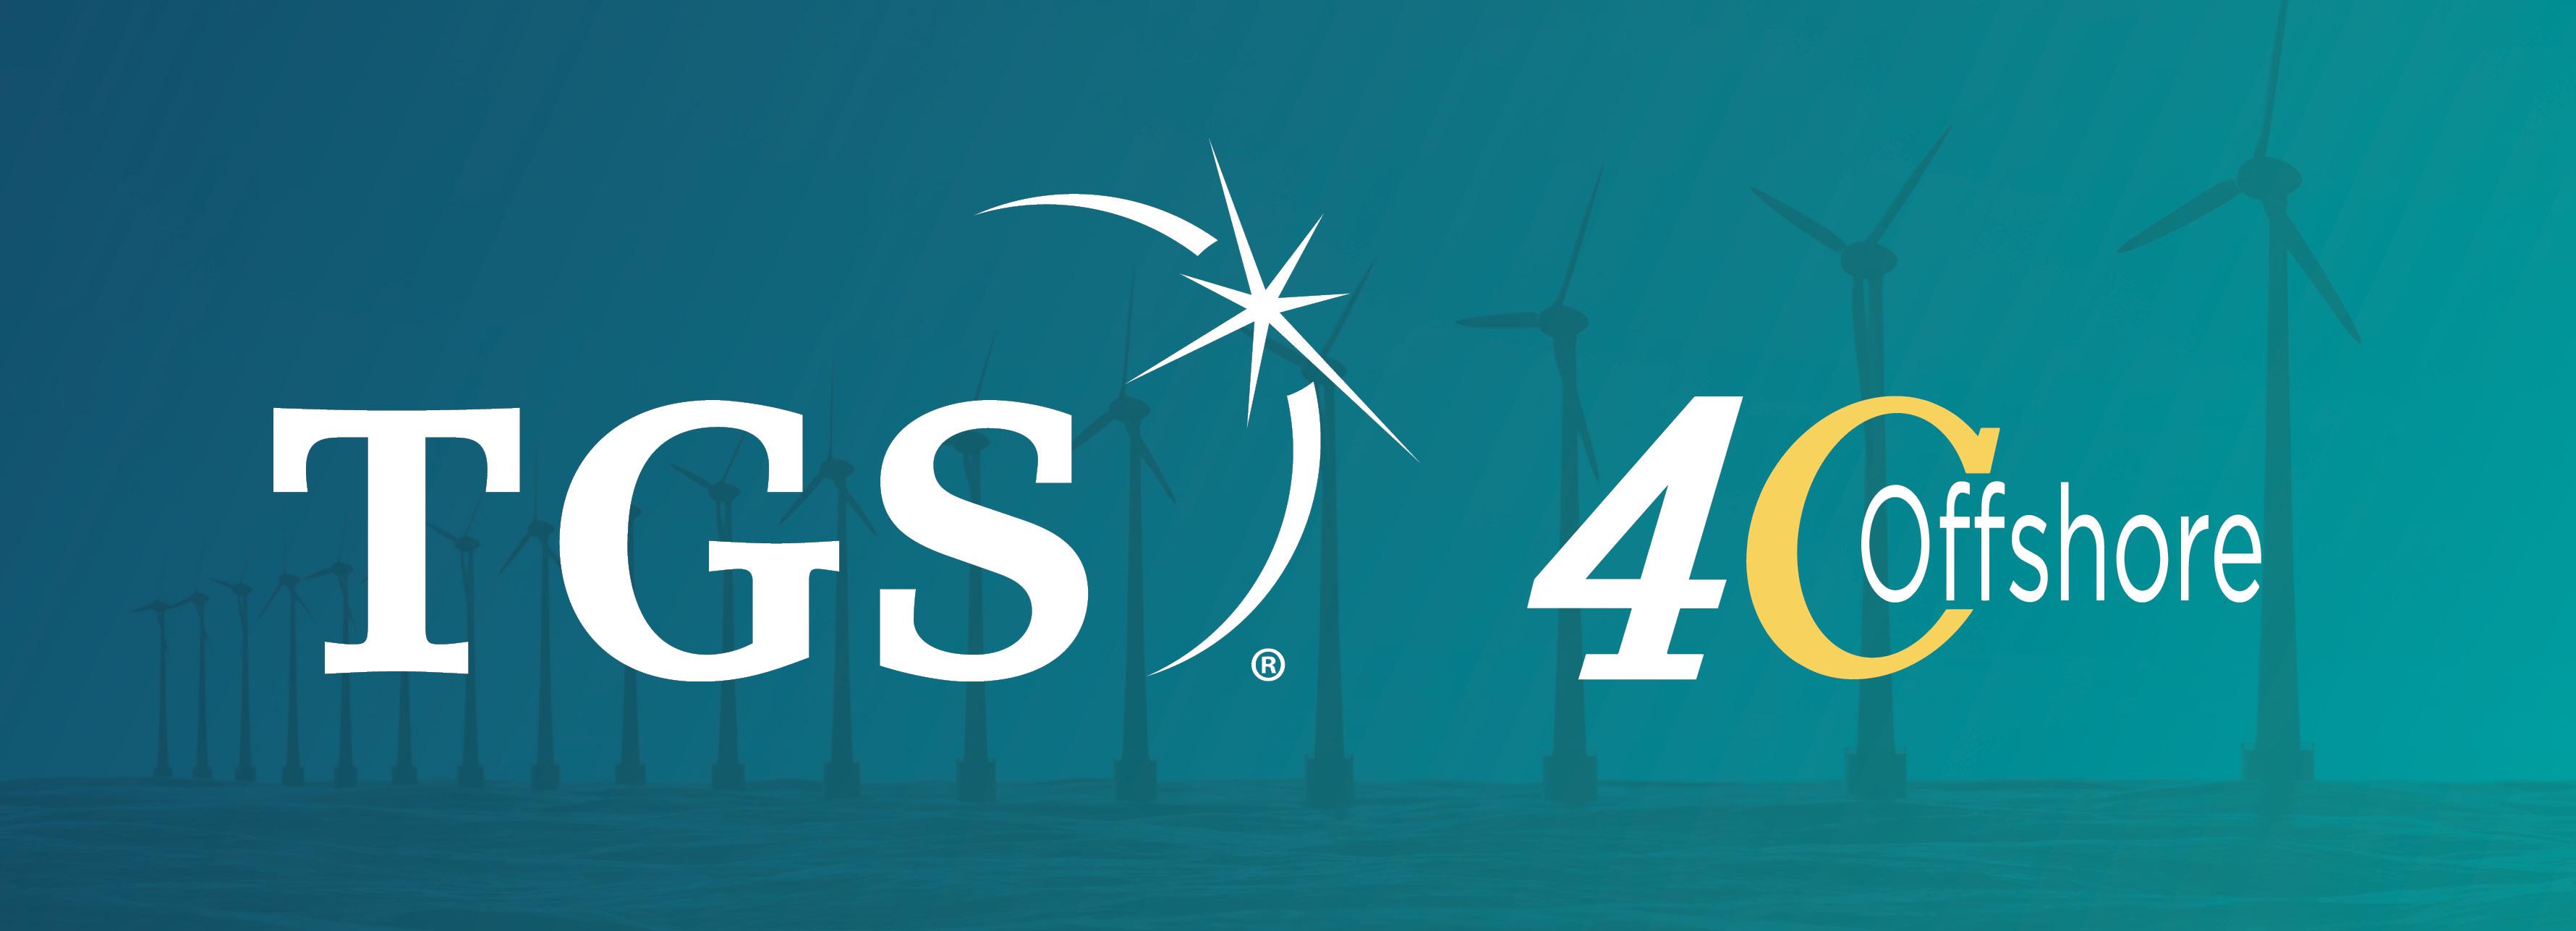 TGS 4C Offshore Logos